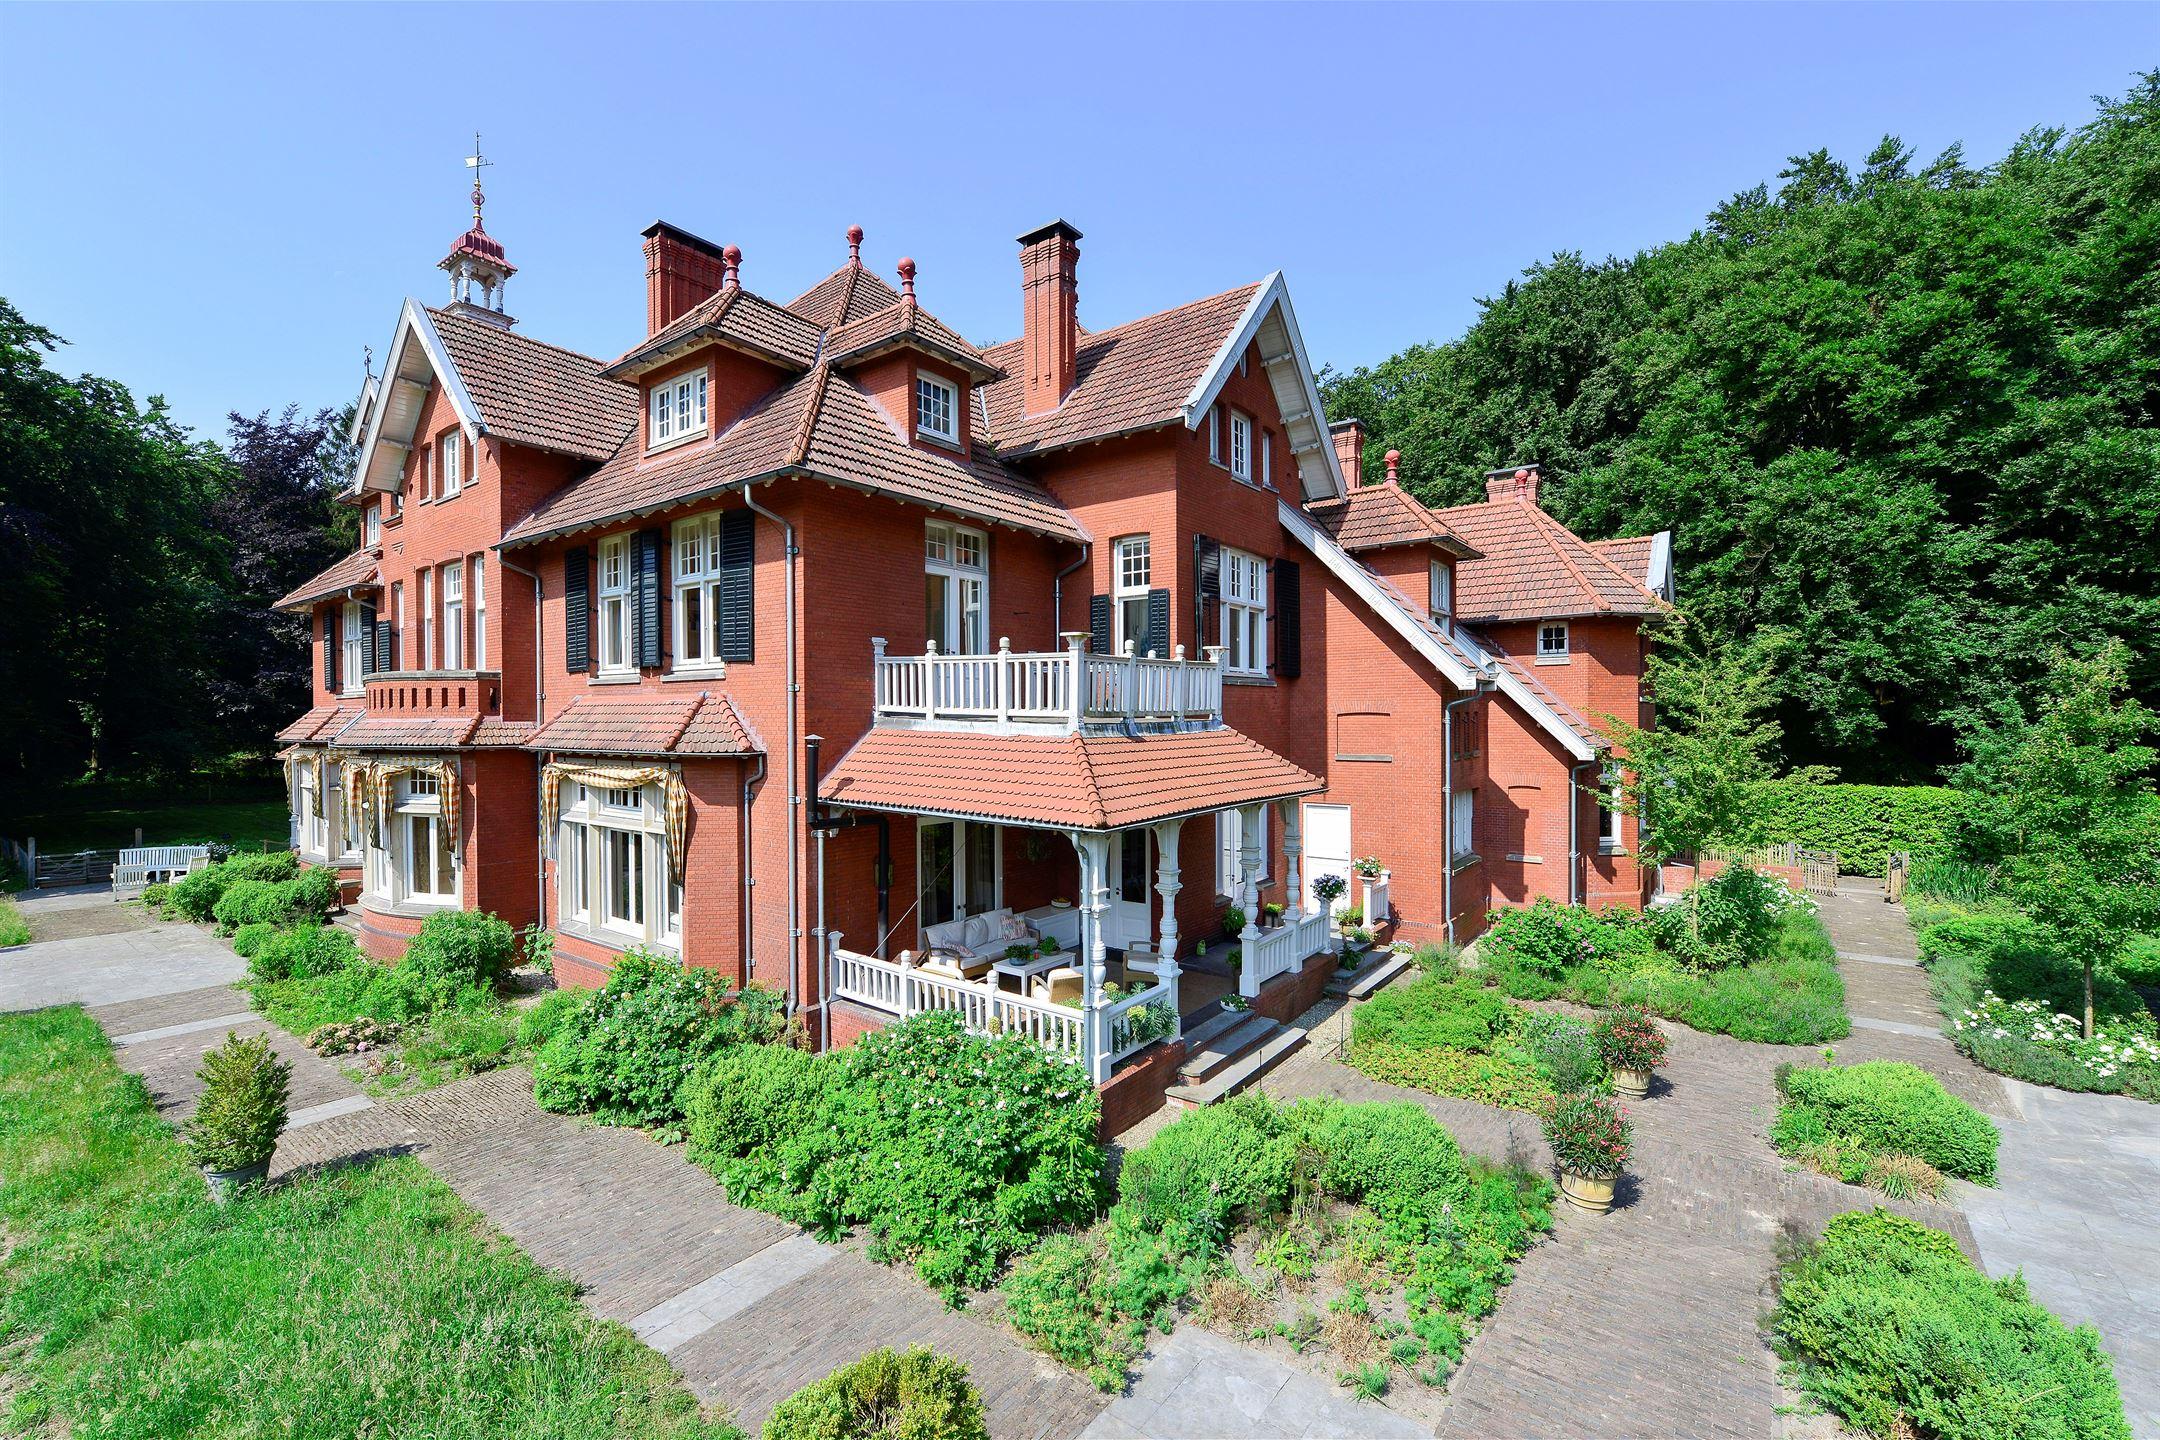 Huis te koop duinlustweg 36 2051 ab overveen funda for Funda landgoed